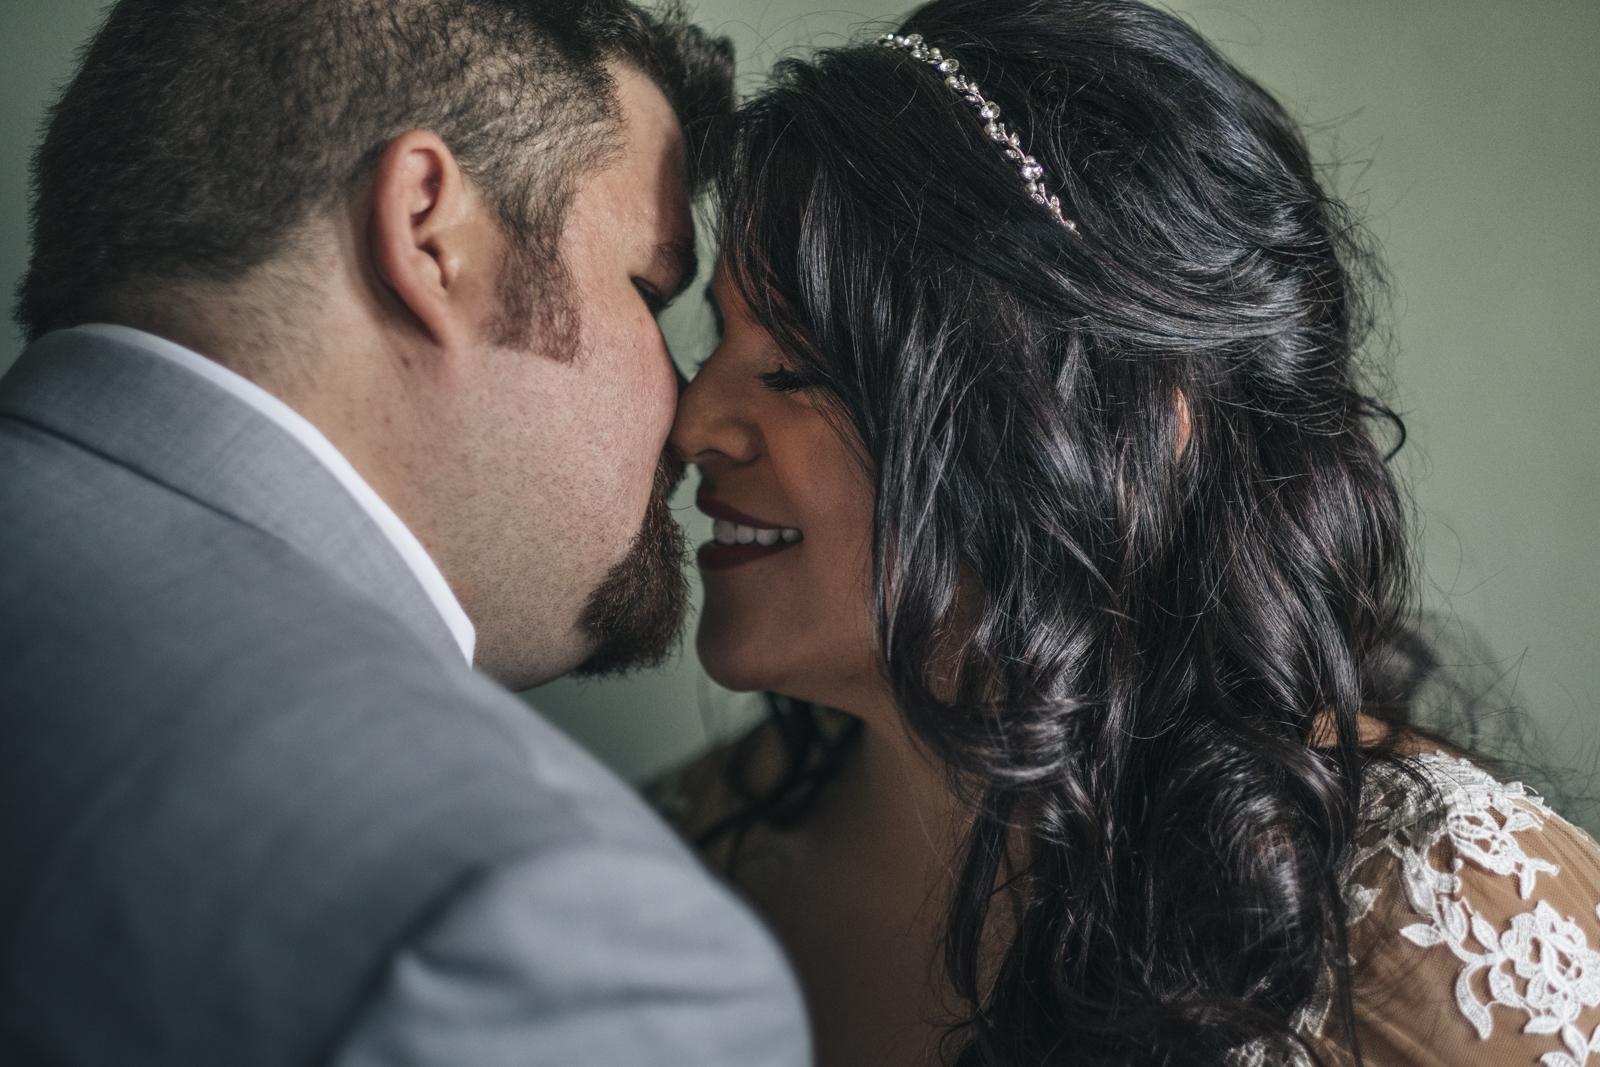 Beautiful bride and groom portrait.